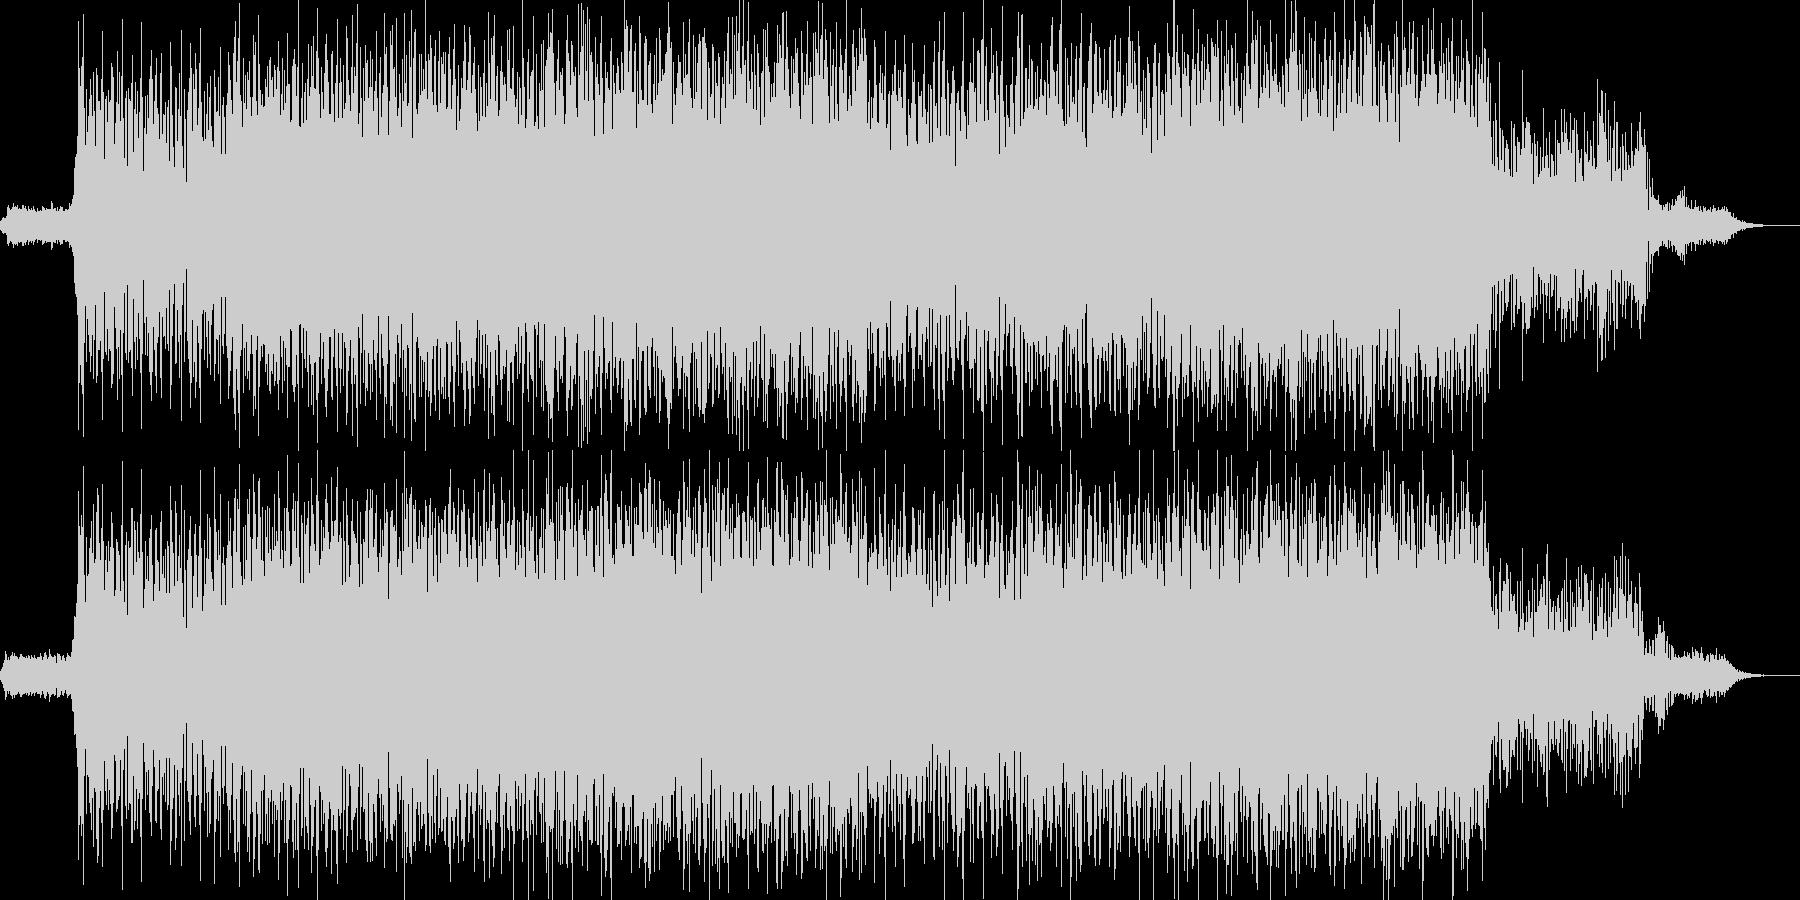 EDM現代的なシンセのクラブ系-04の未再生の波形